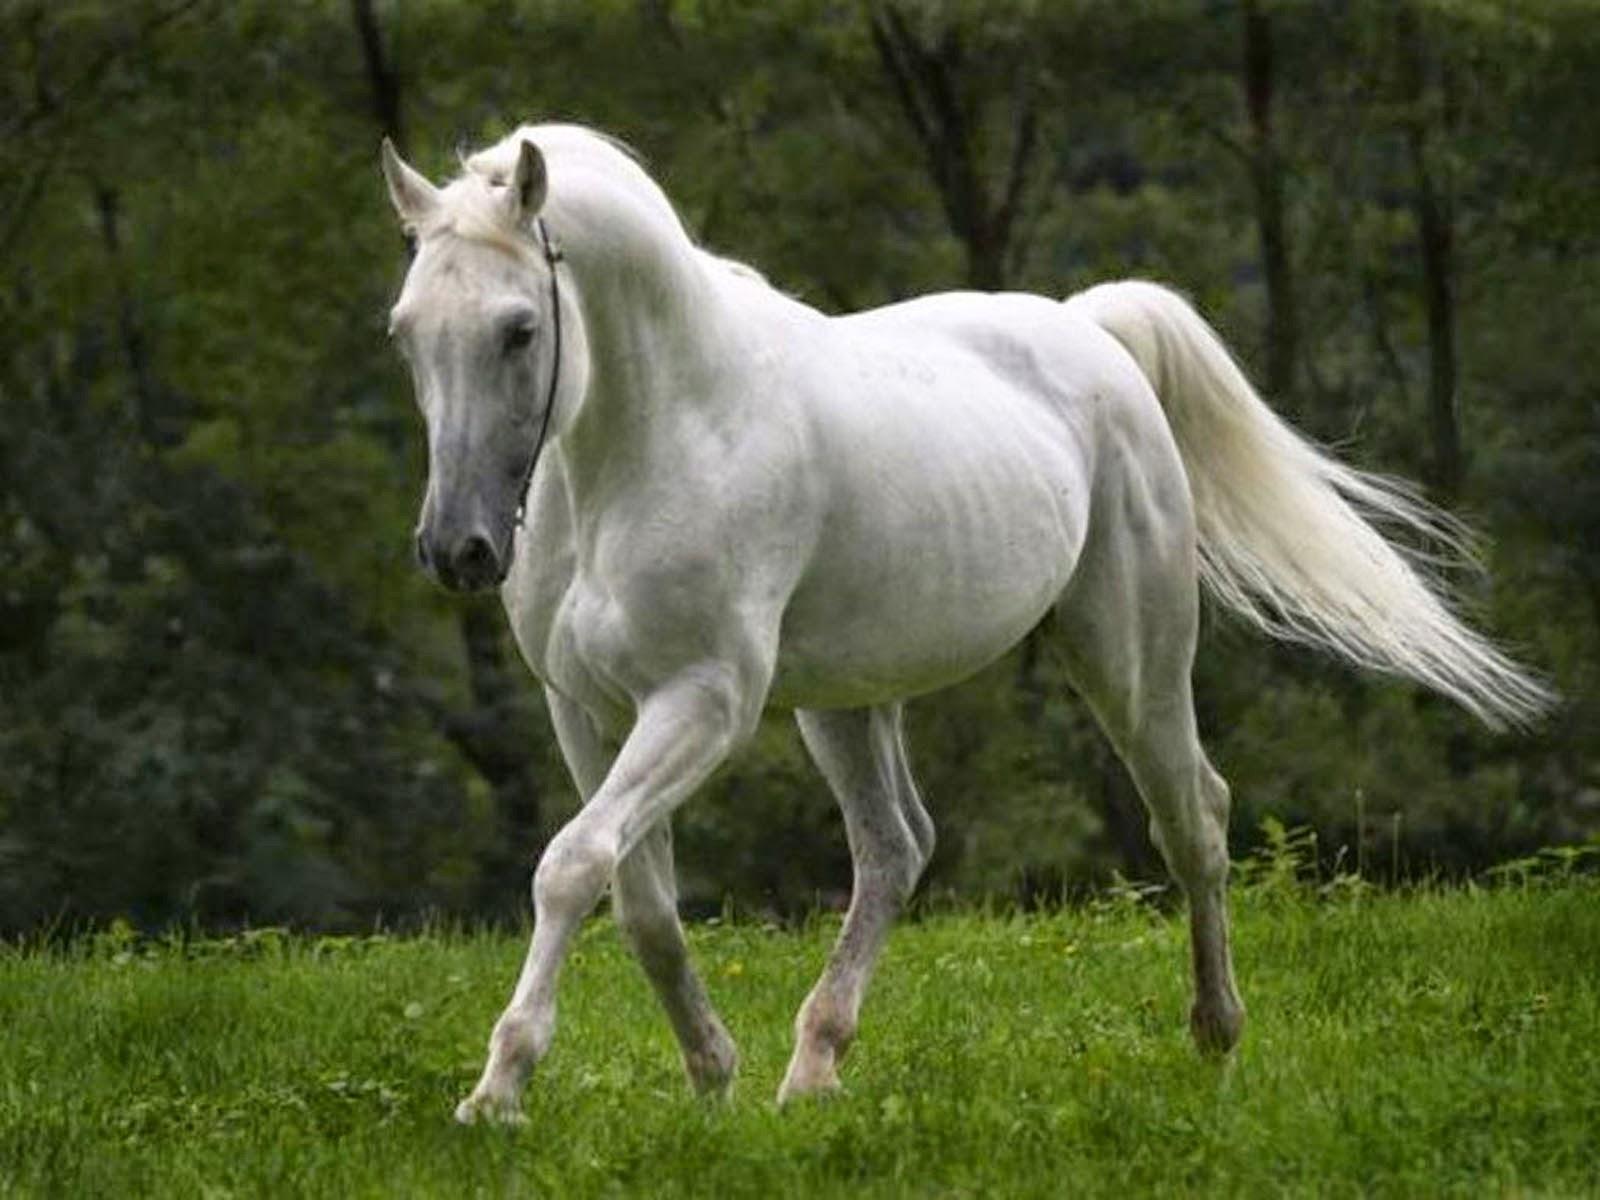 Simple   Wallpaper Horse Desktop Background - Horse+Wallpapers+(4)  Best Photo Reference_56941.jpg